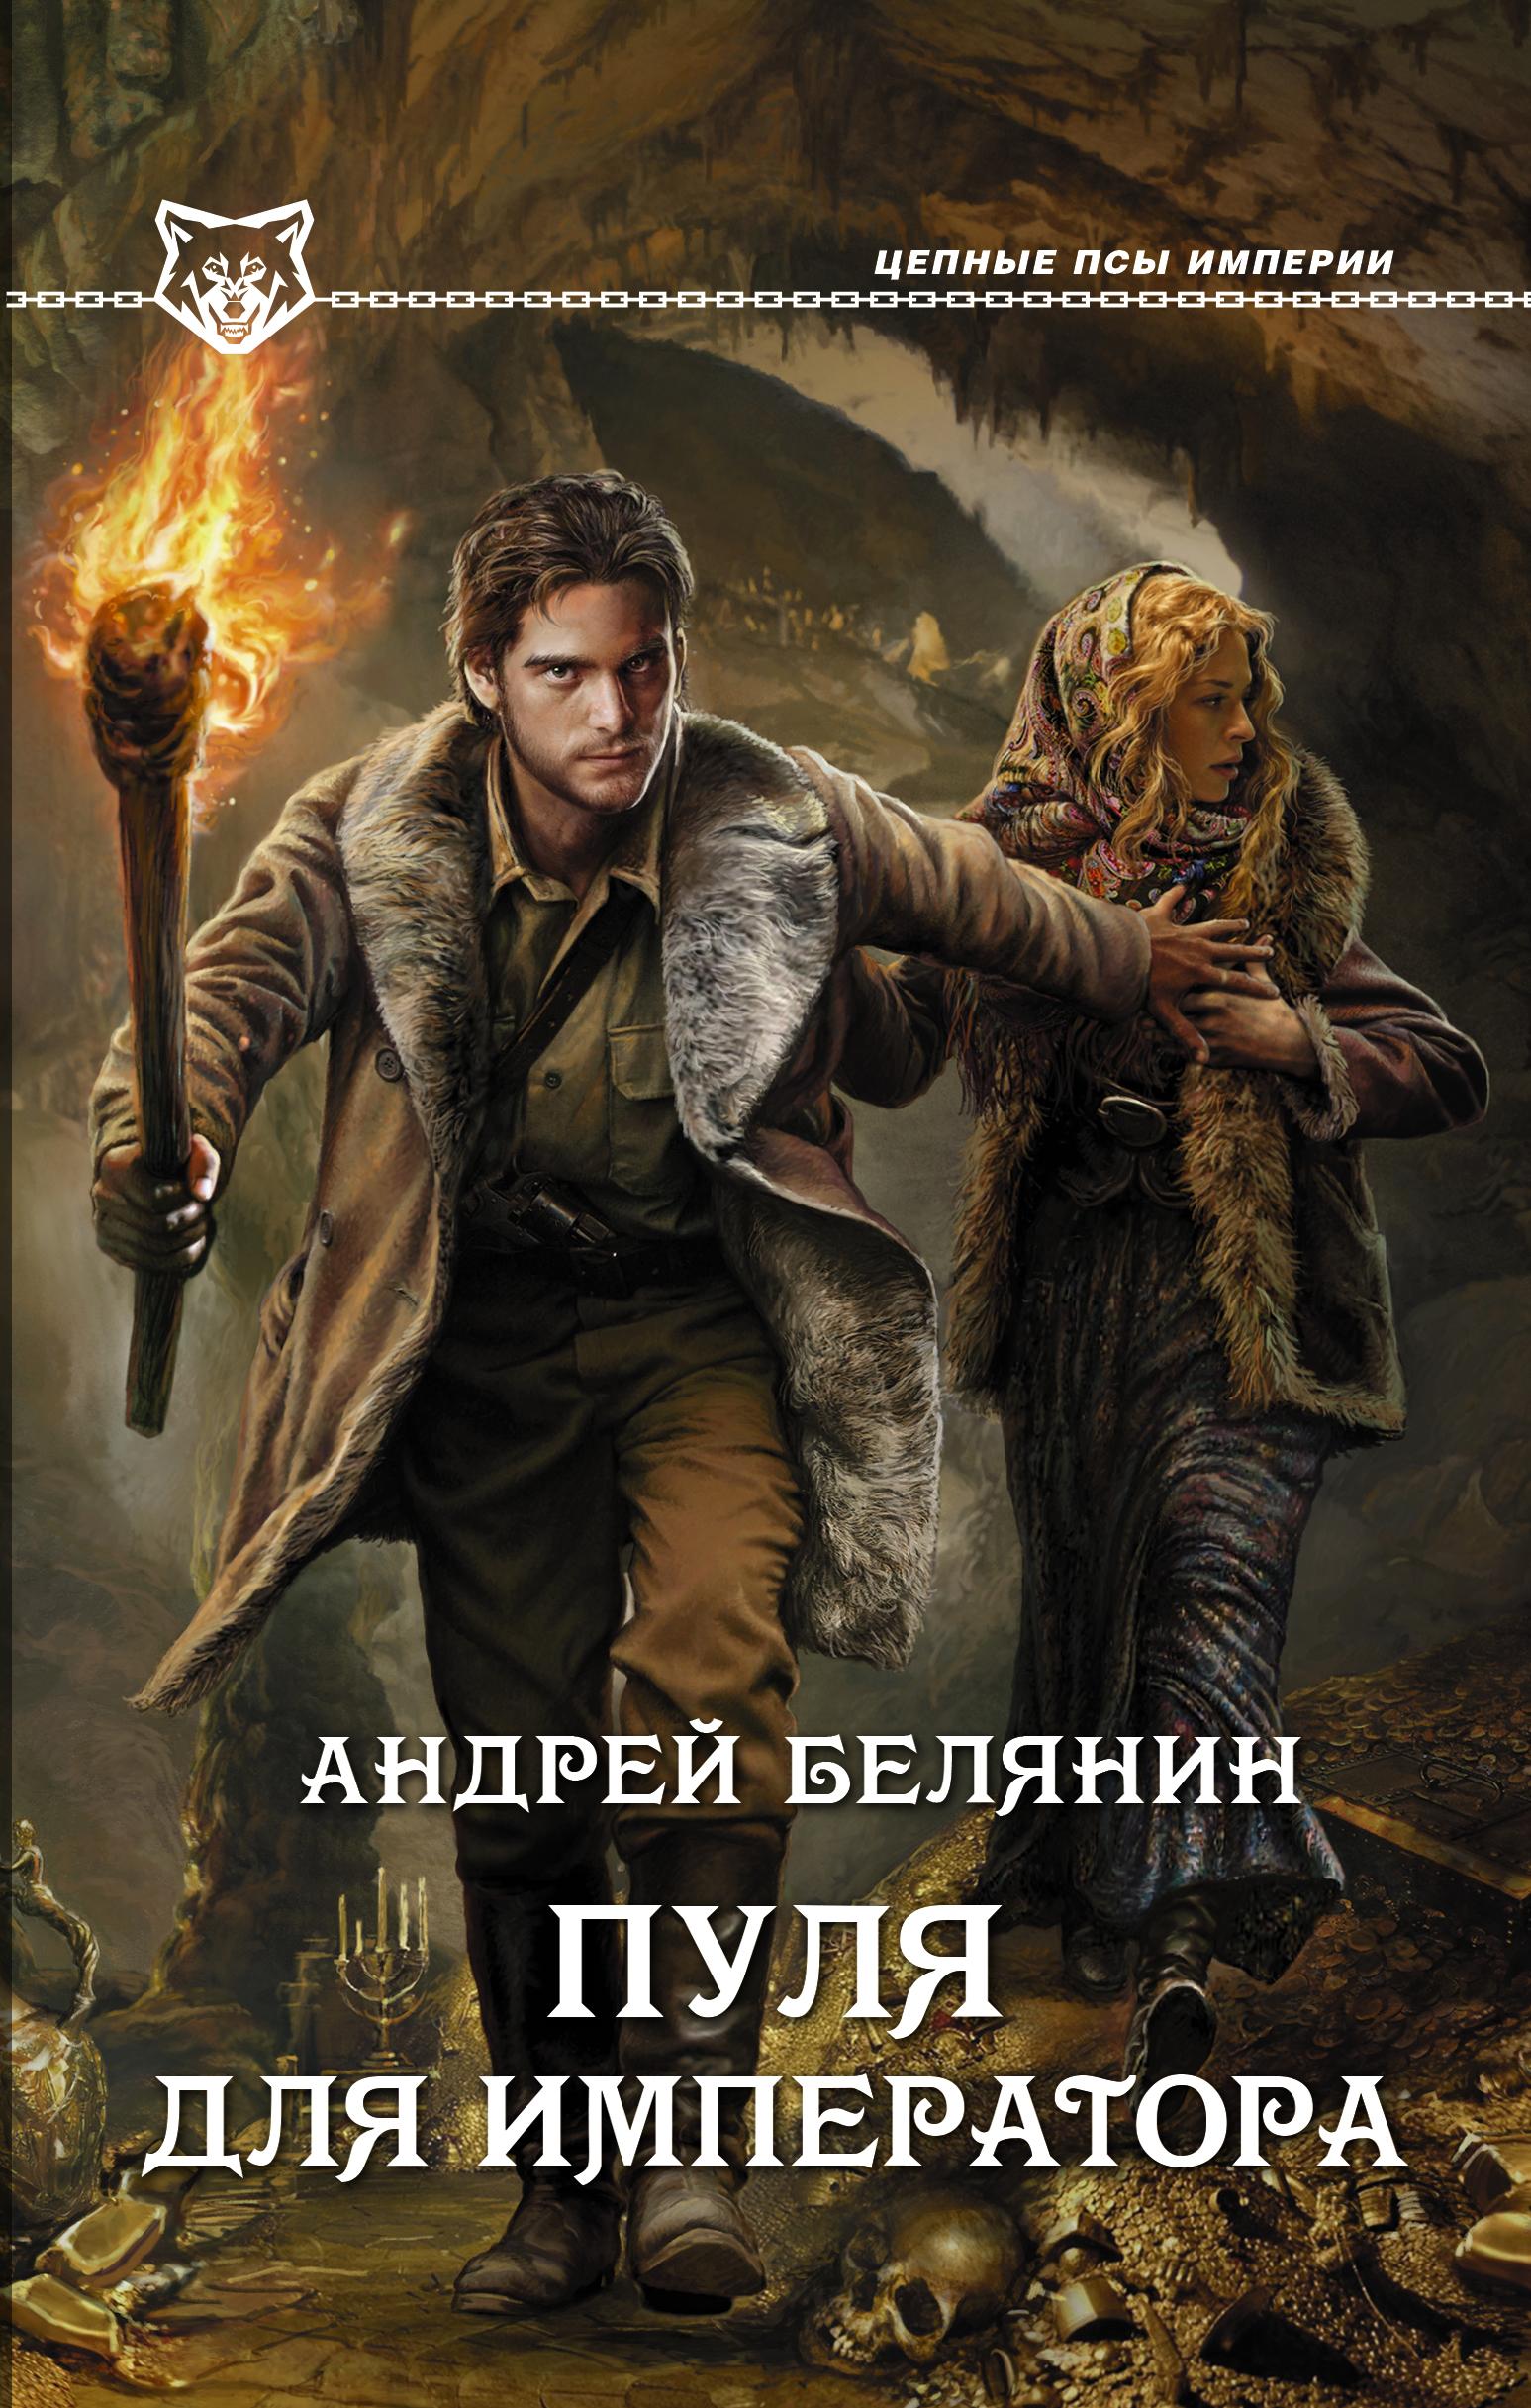 Андрей Белянин Пуля для императора цена 2017